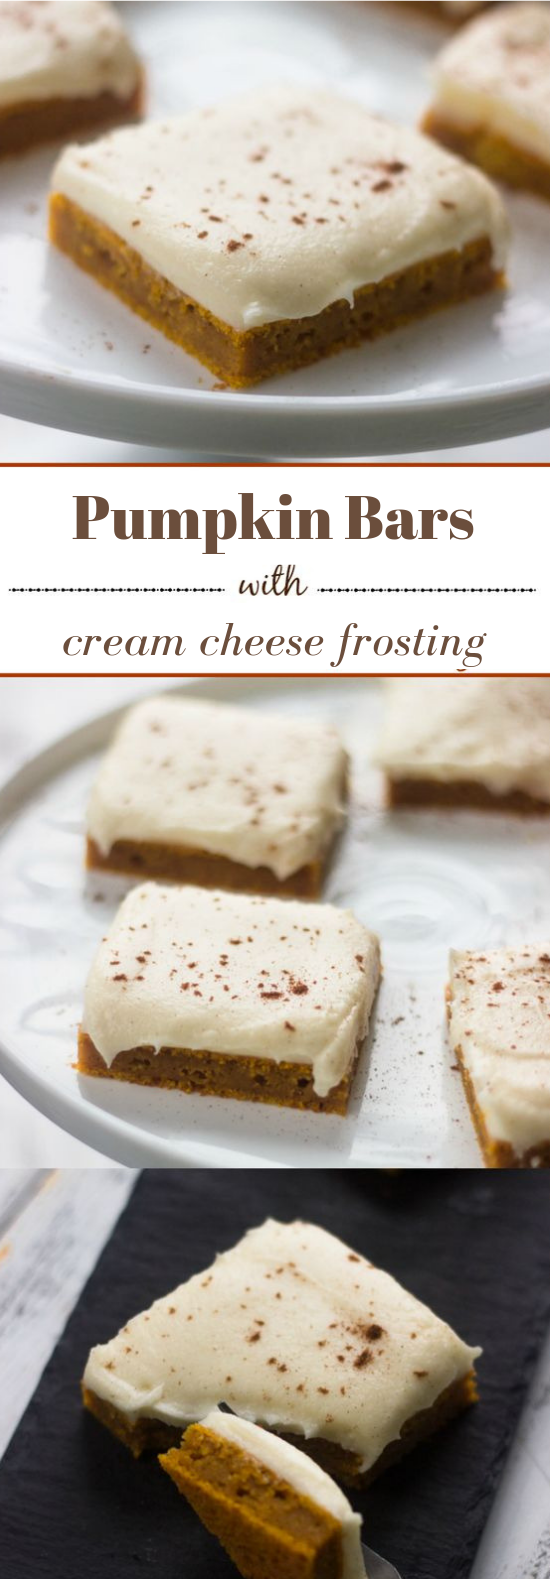 PUMPKIN BARS WITH CREAM CHEESE FROSTING #dessert #pumpkin